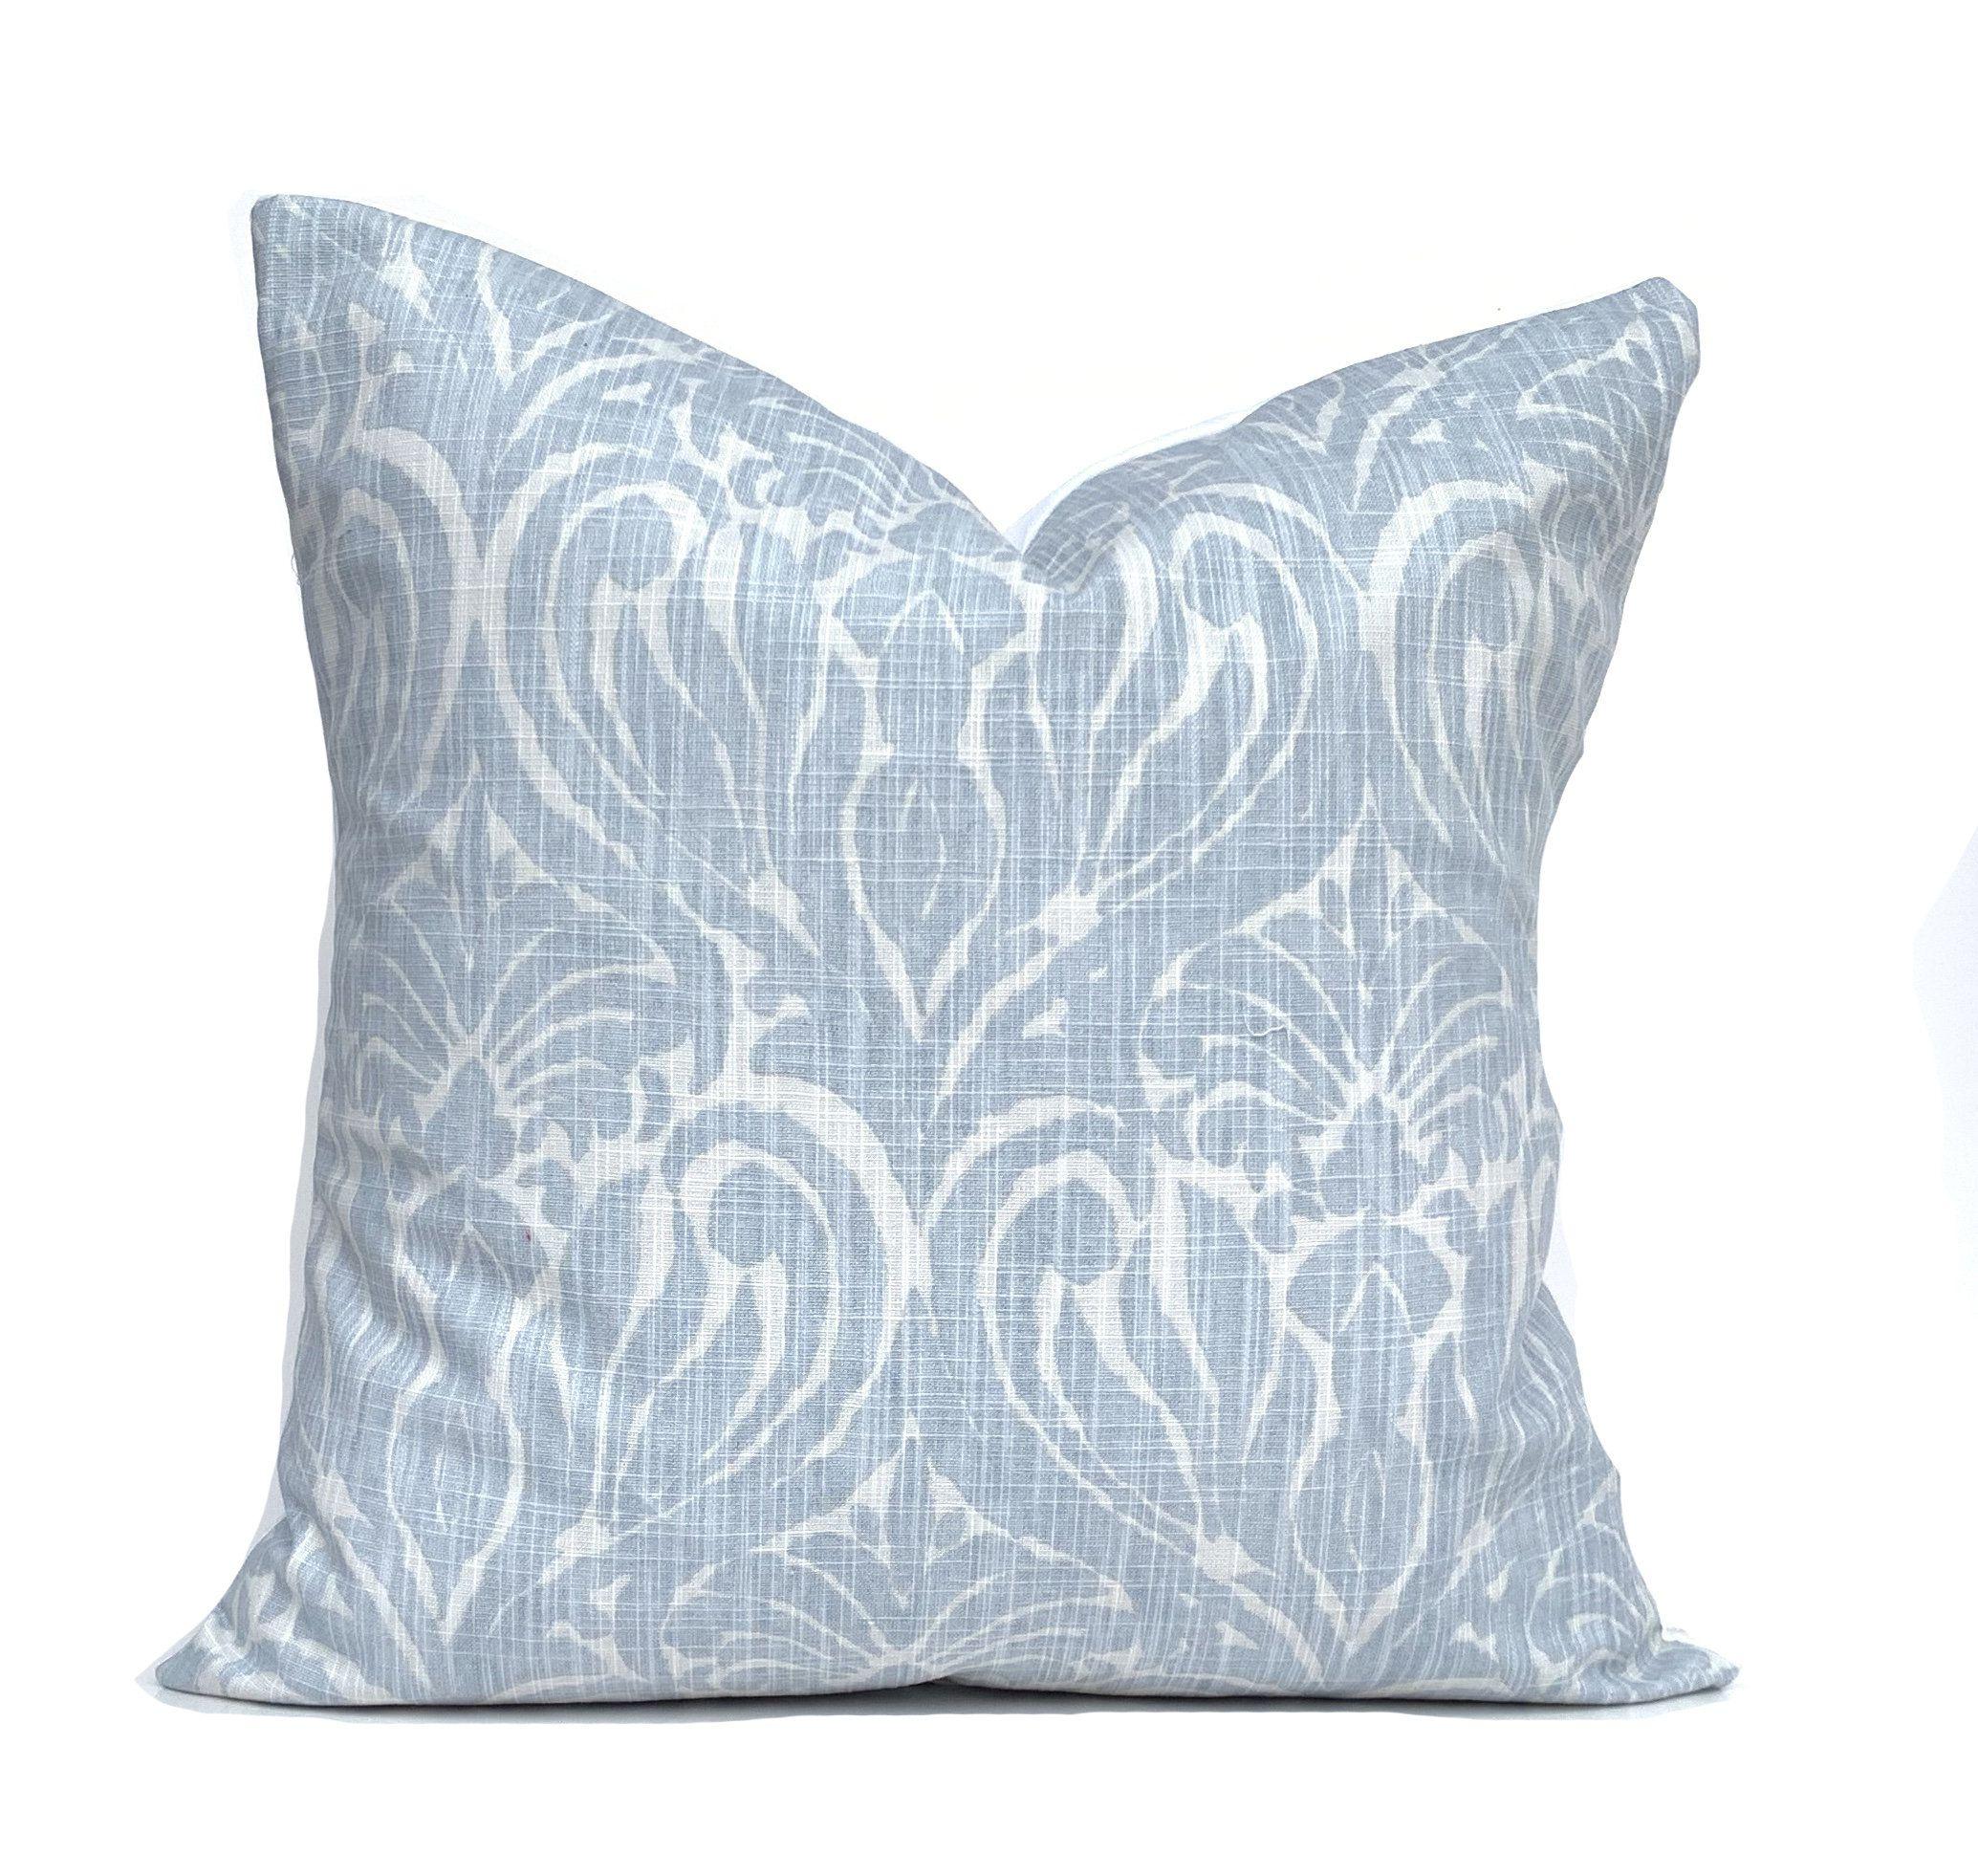 Blue Floral Pillow Cover Grey Blue Decorative Pillows Premier Prints Light Blue Pillow Throw Pillow Blue Floral Pillows Light Blue Pillows Floral Pillow Cover